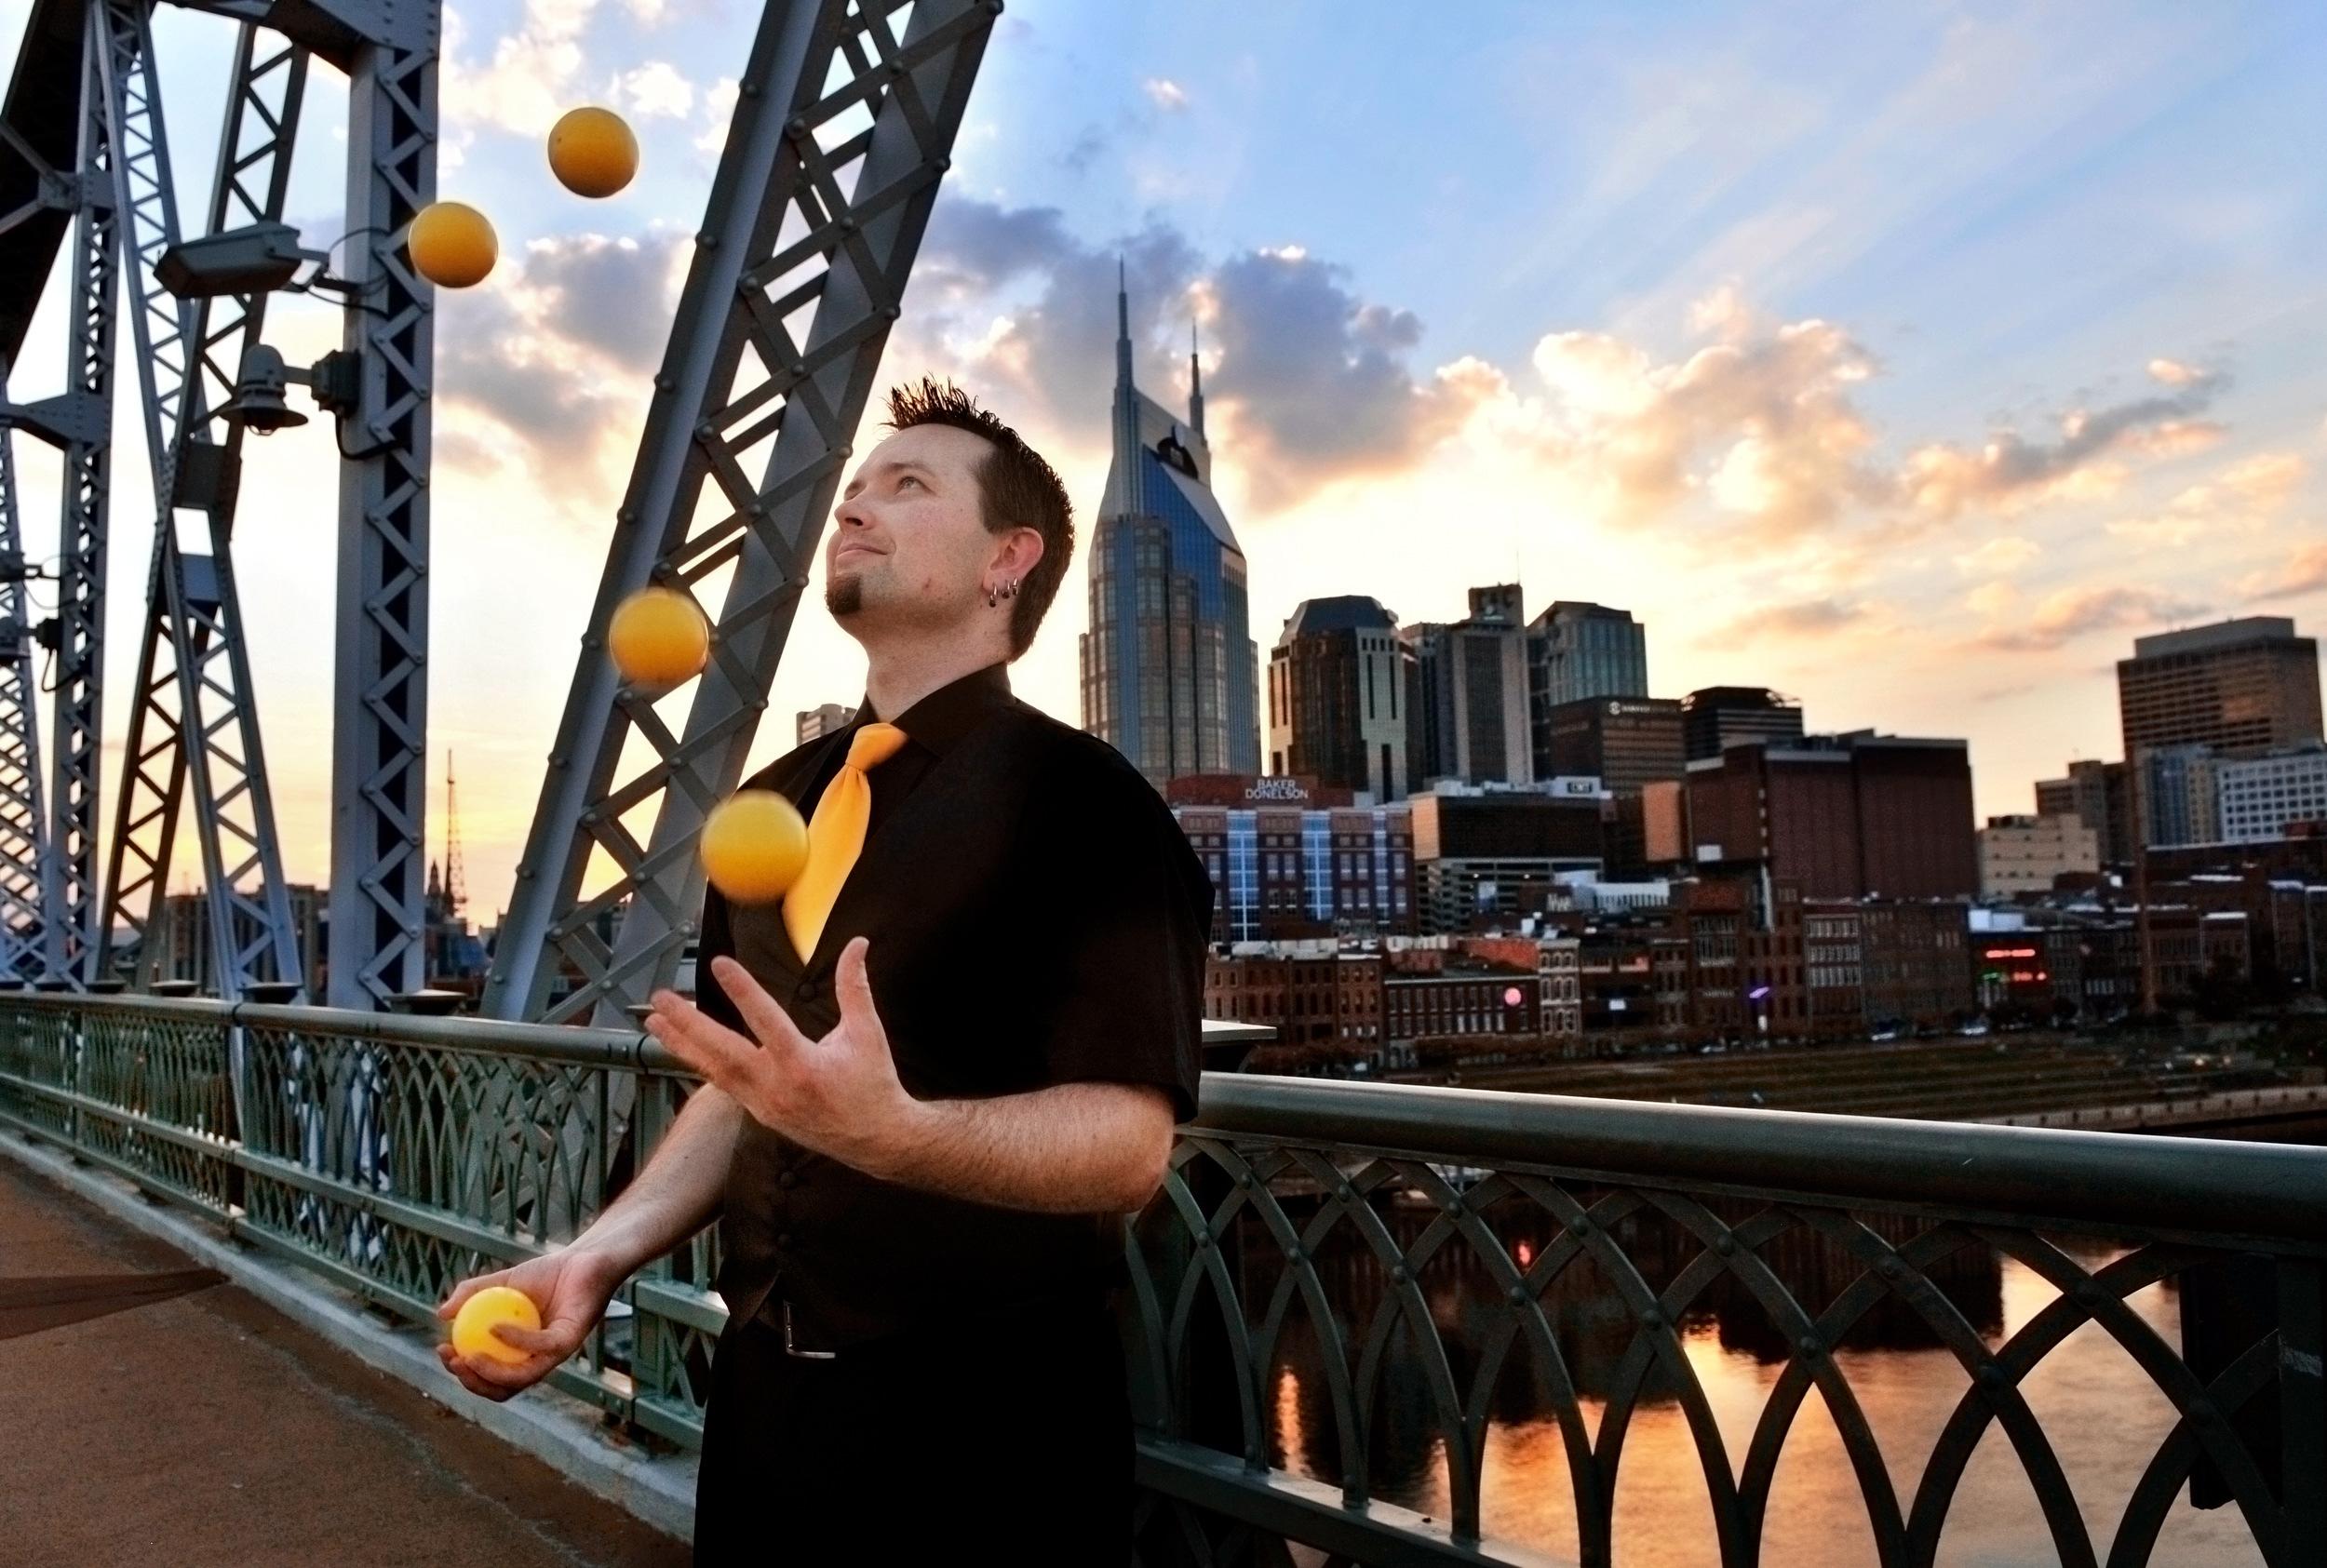 Ted Joblin juggles on the Shelby Street Pedestrian Bridge in Nashville, Tenn.